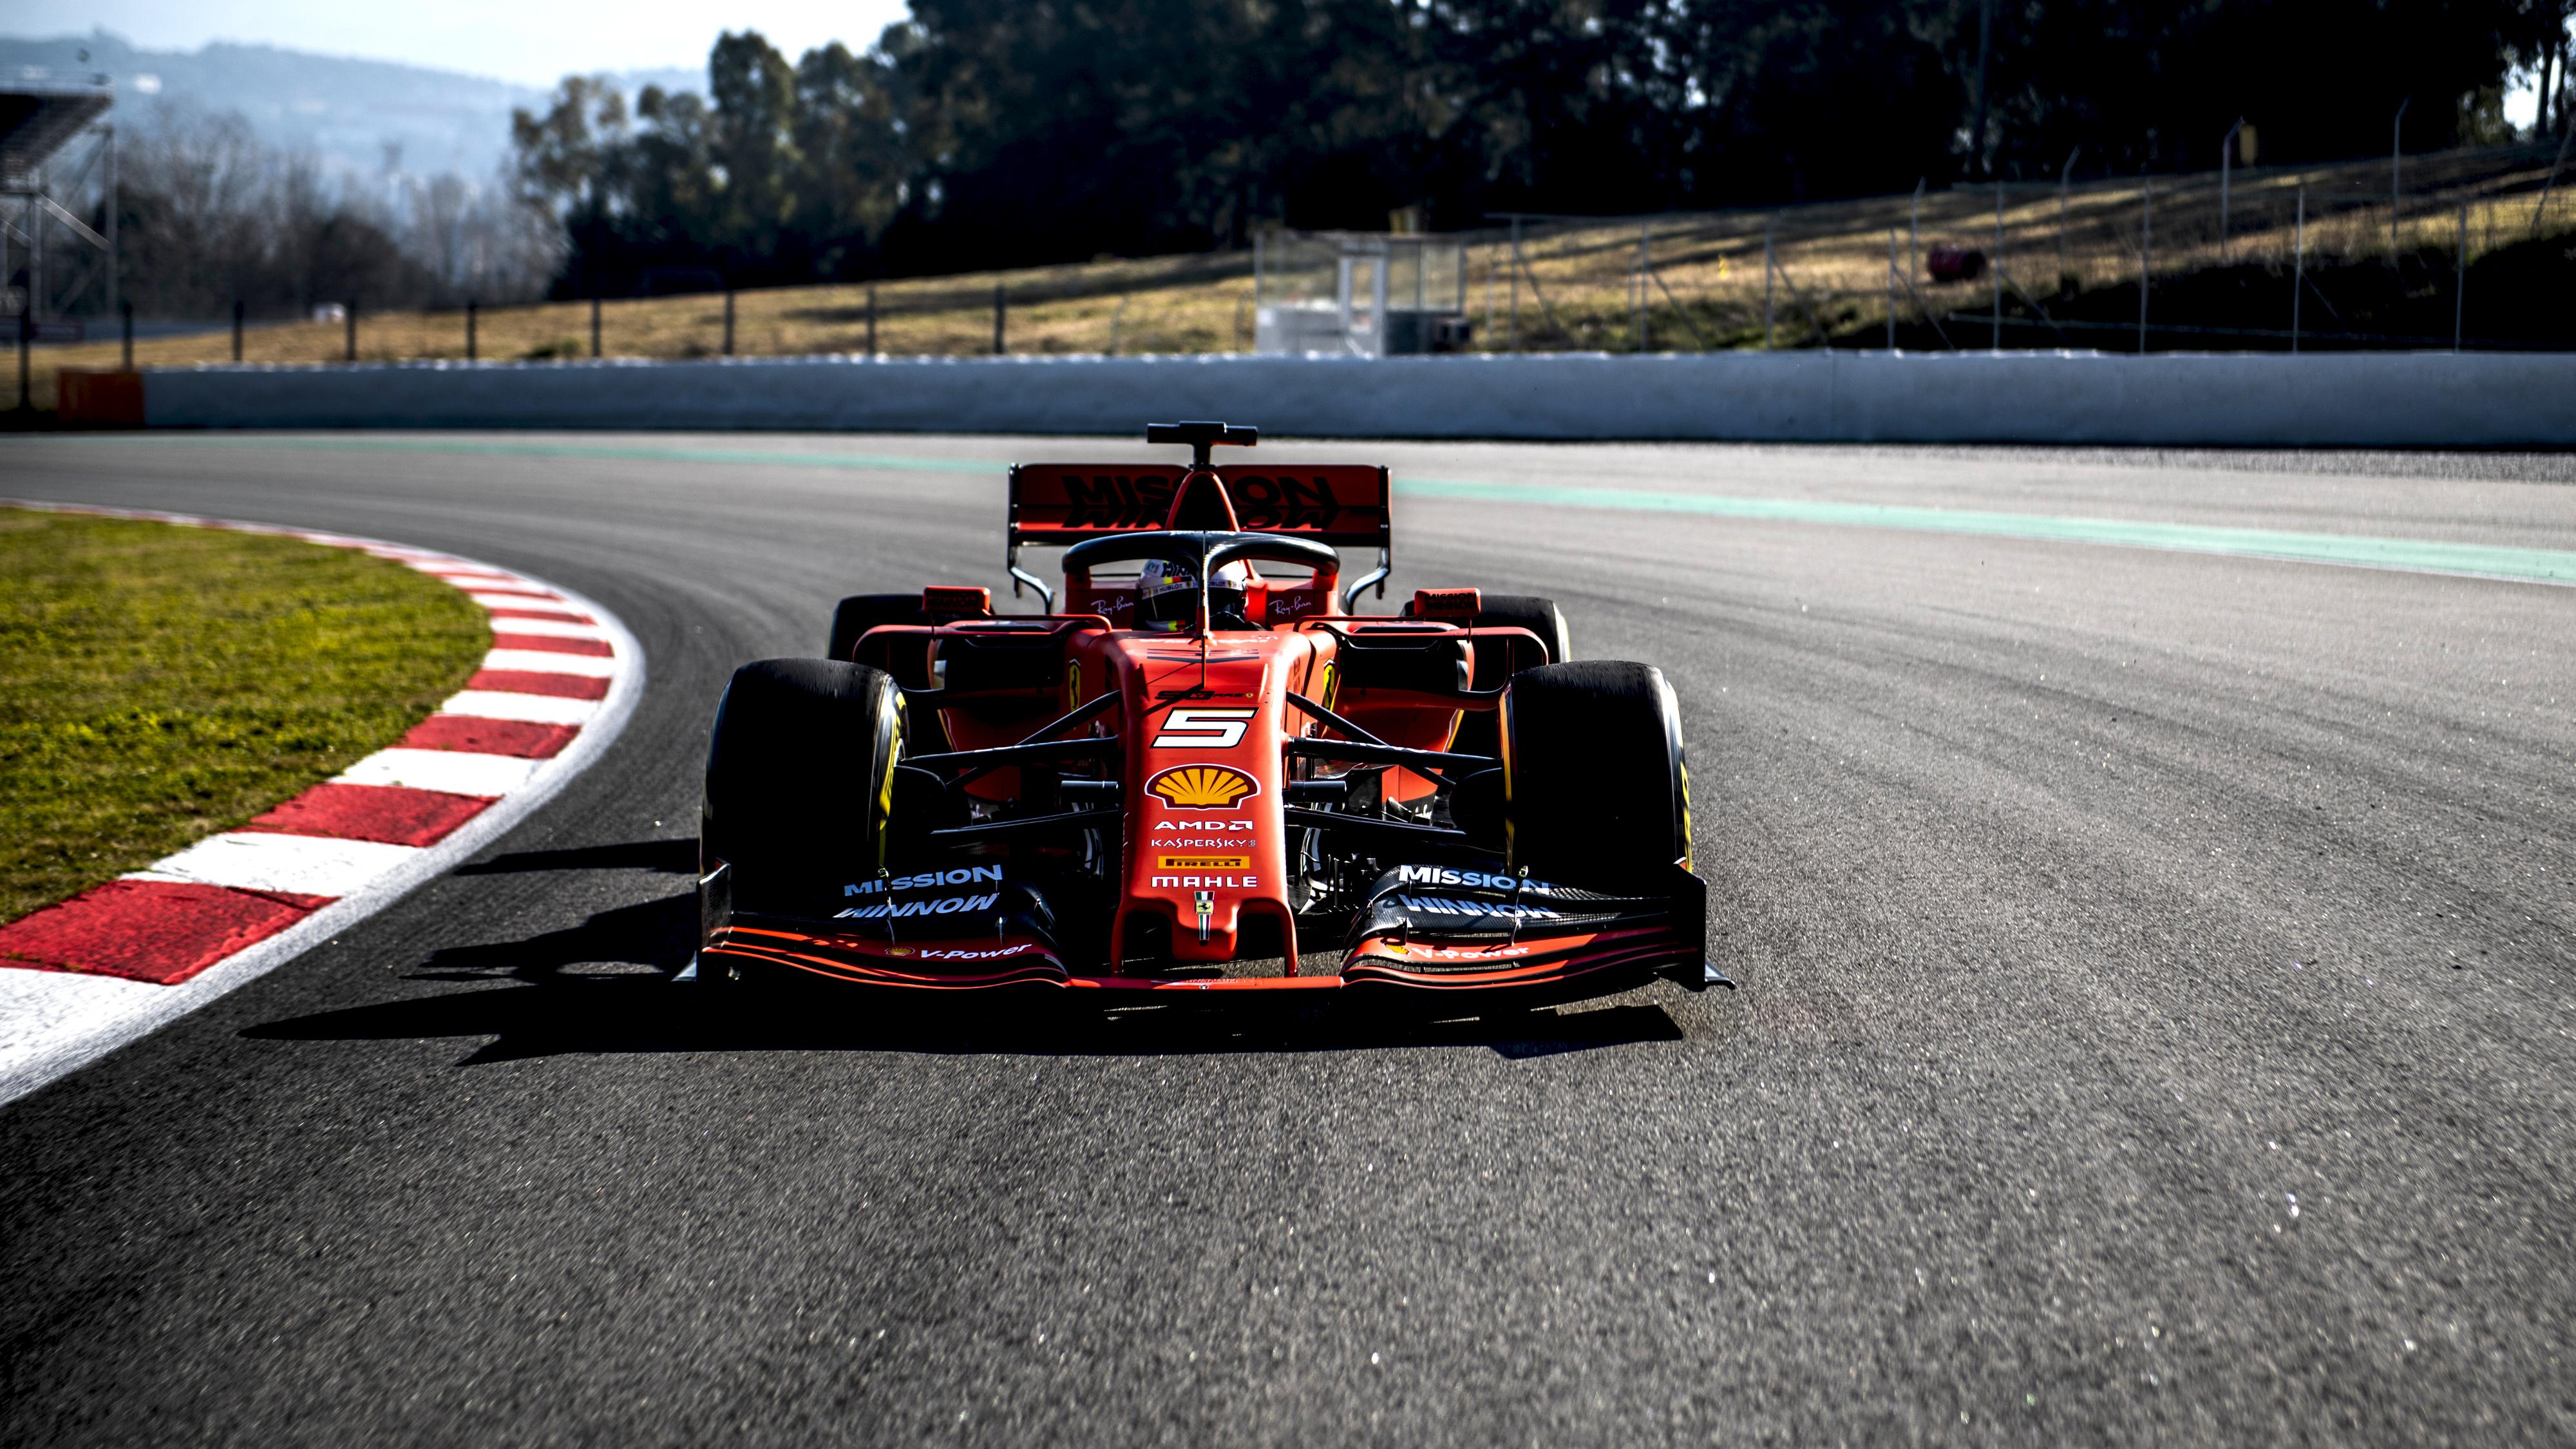 Ferrari Sf90 Formula 1 2019 5k 2 Wallpaper Hd Car